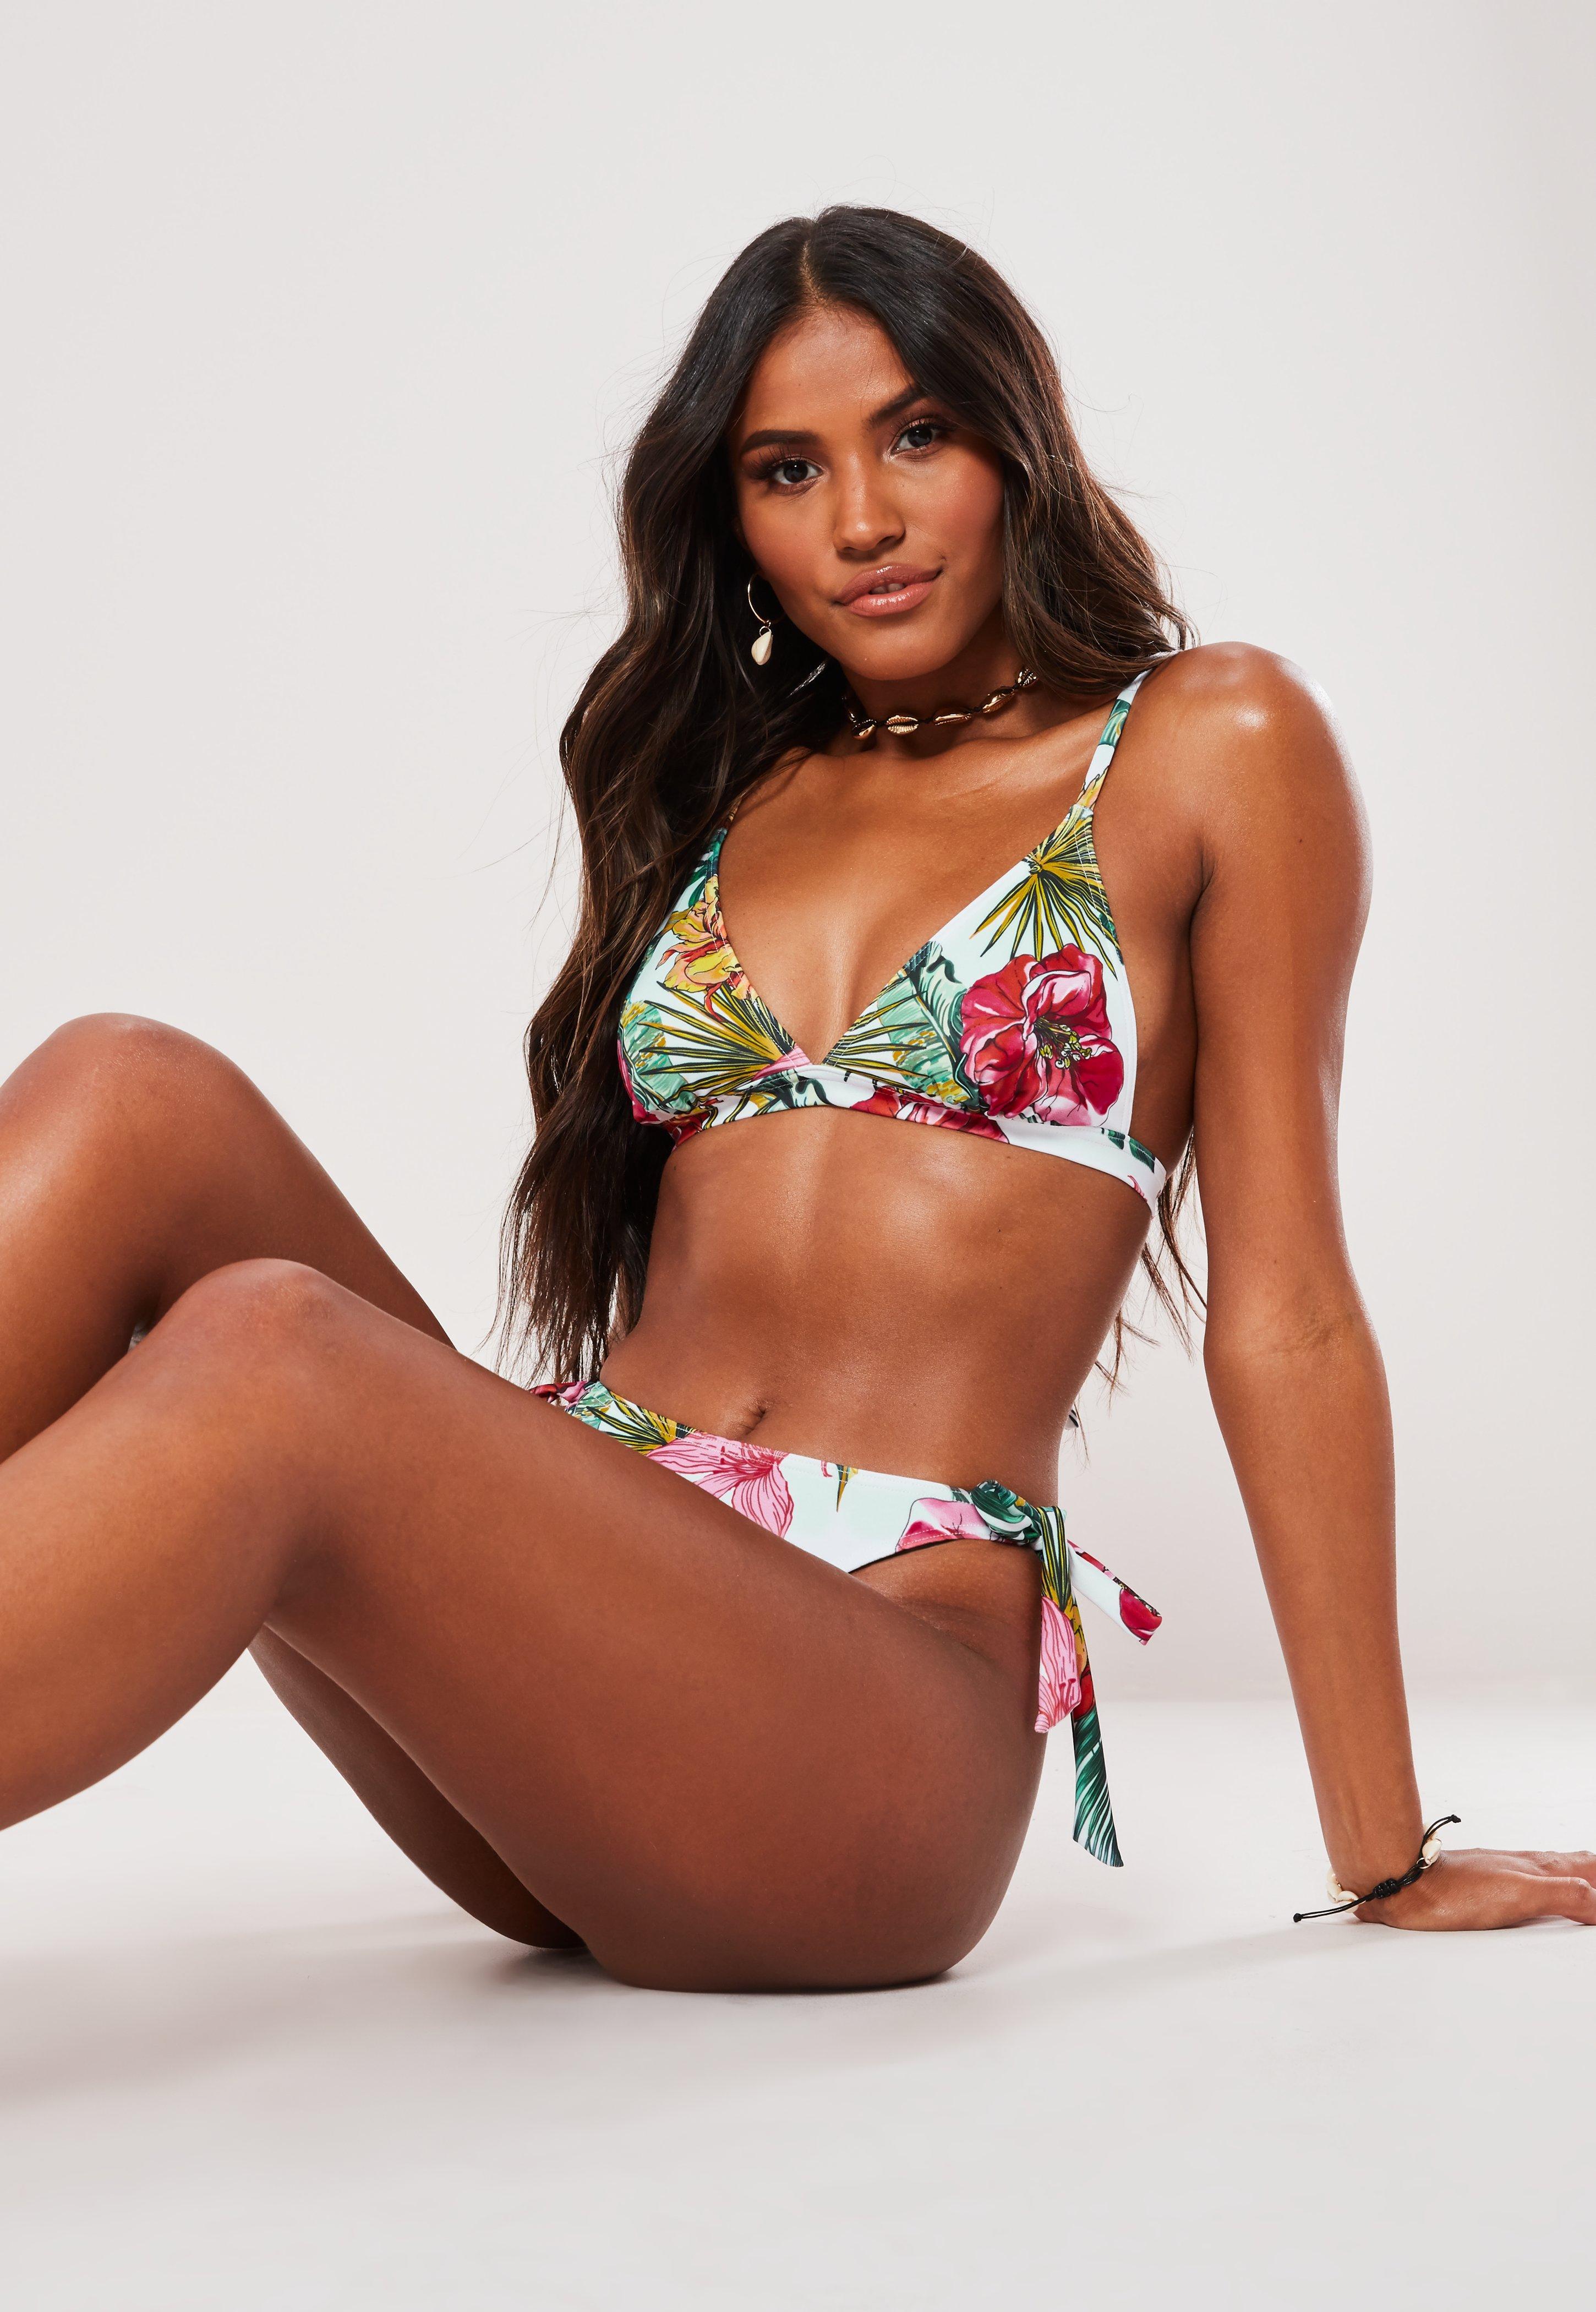 Thick latina women bikini